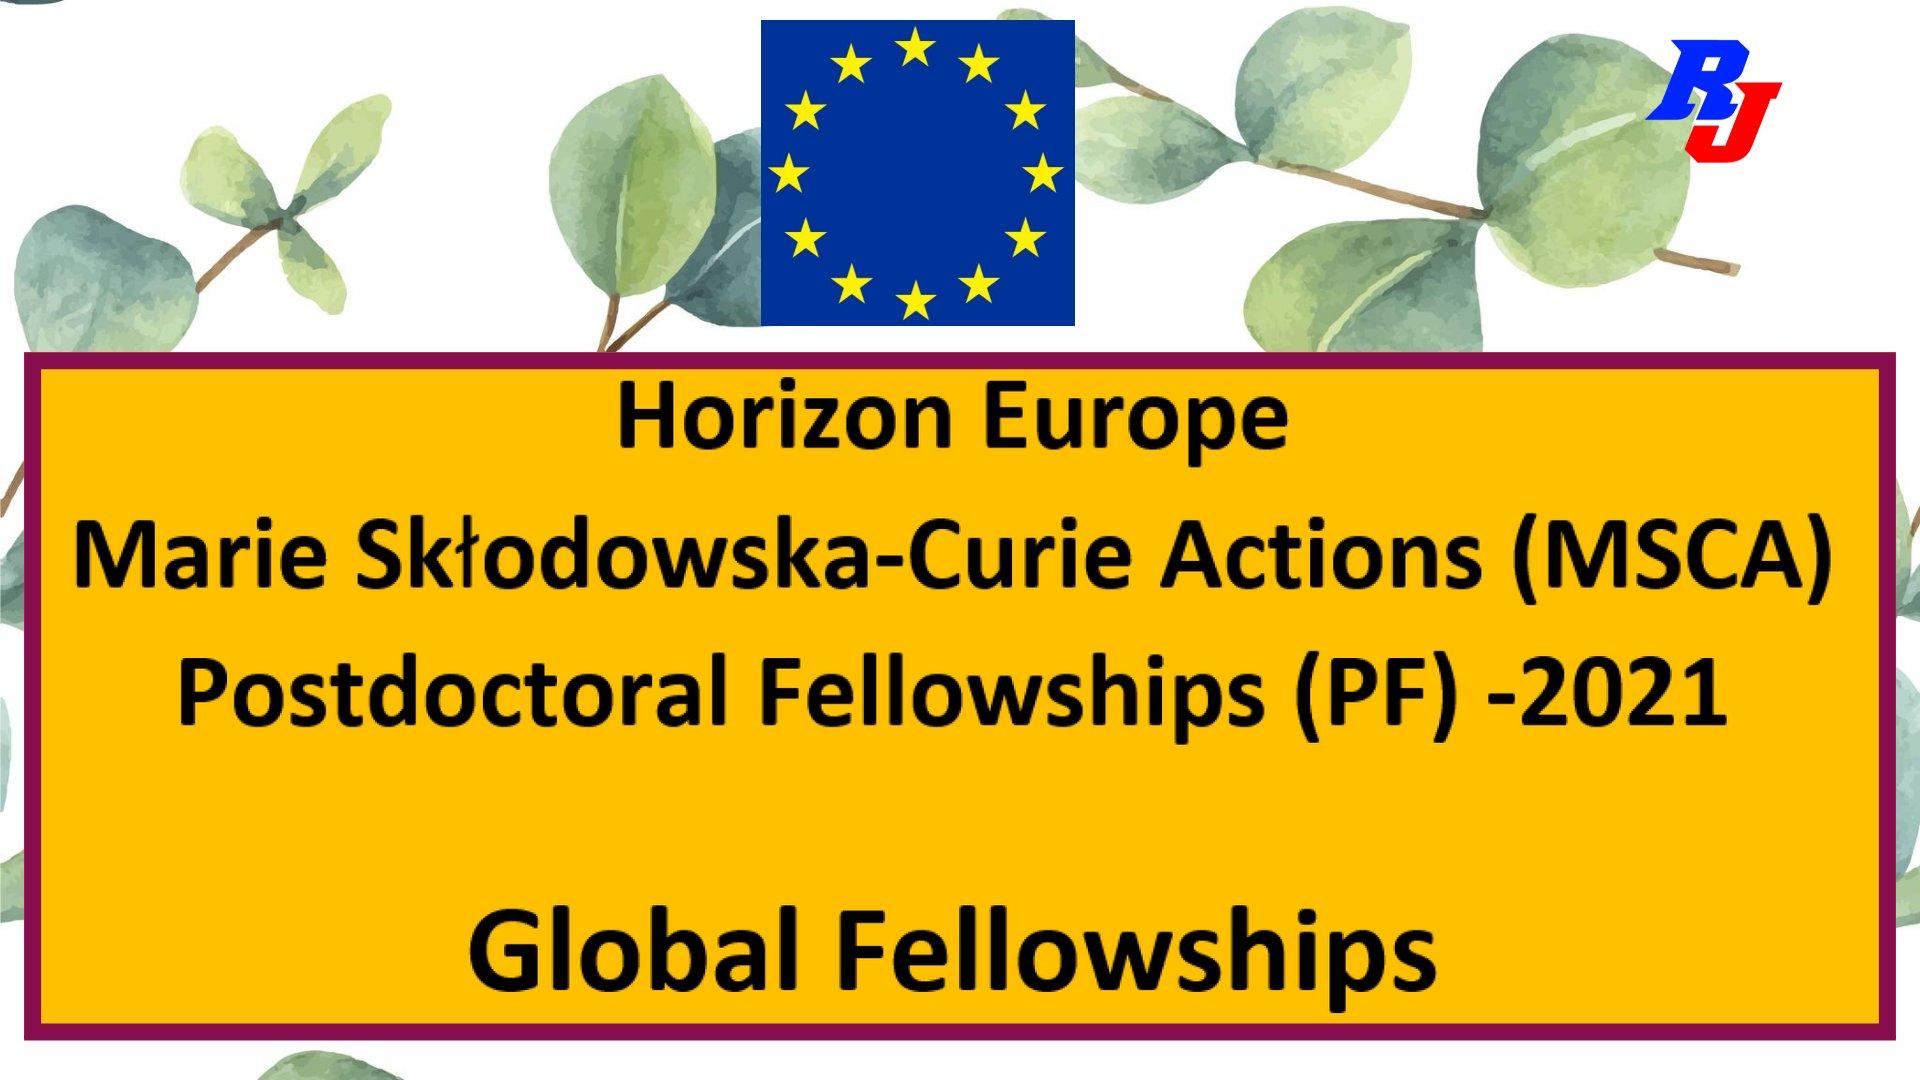 MSCA Postdoctoral Fellowships 2021 (Global Fellowships) under Horizon Europe